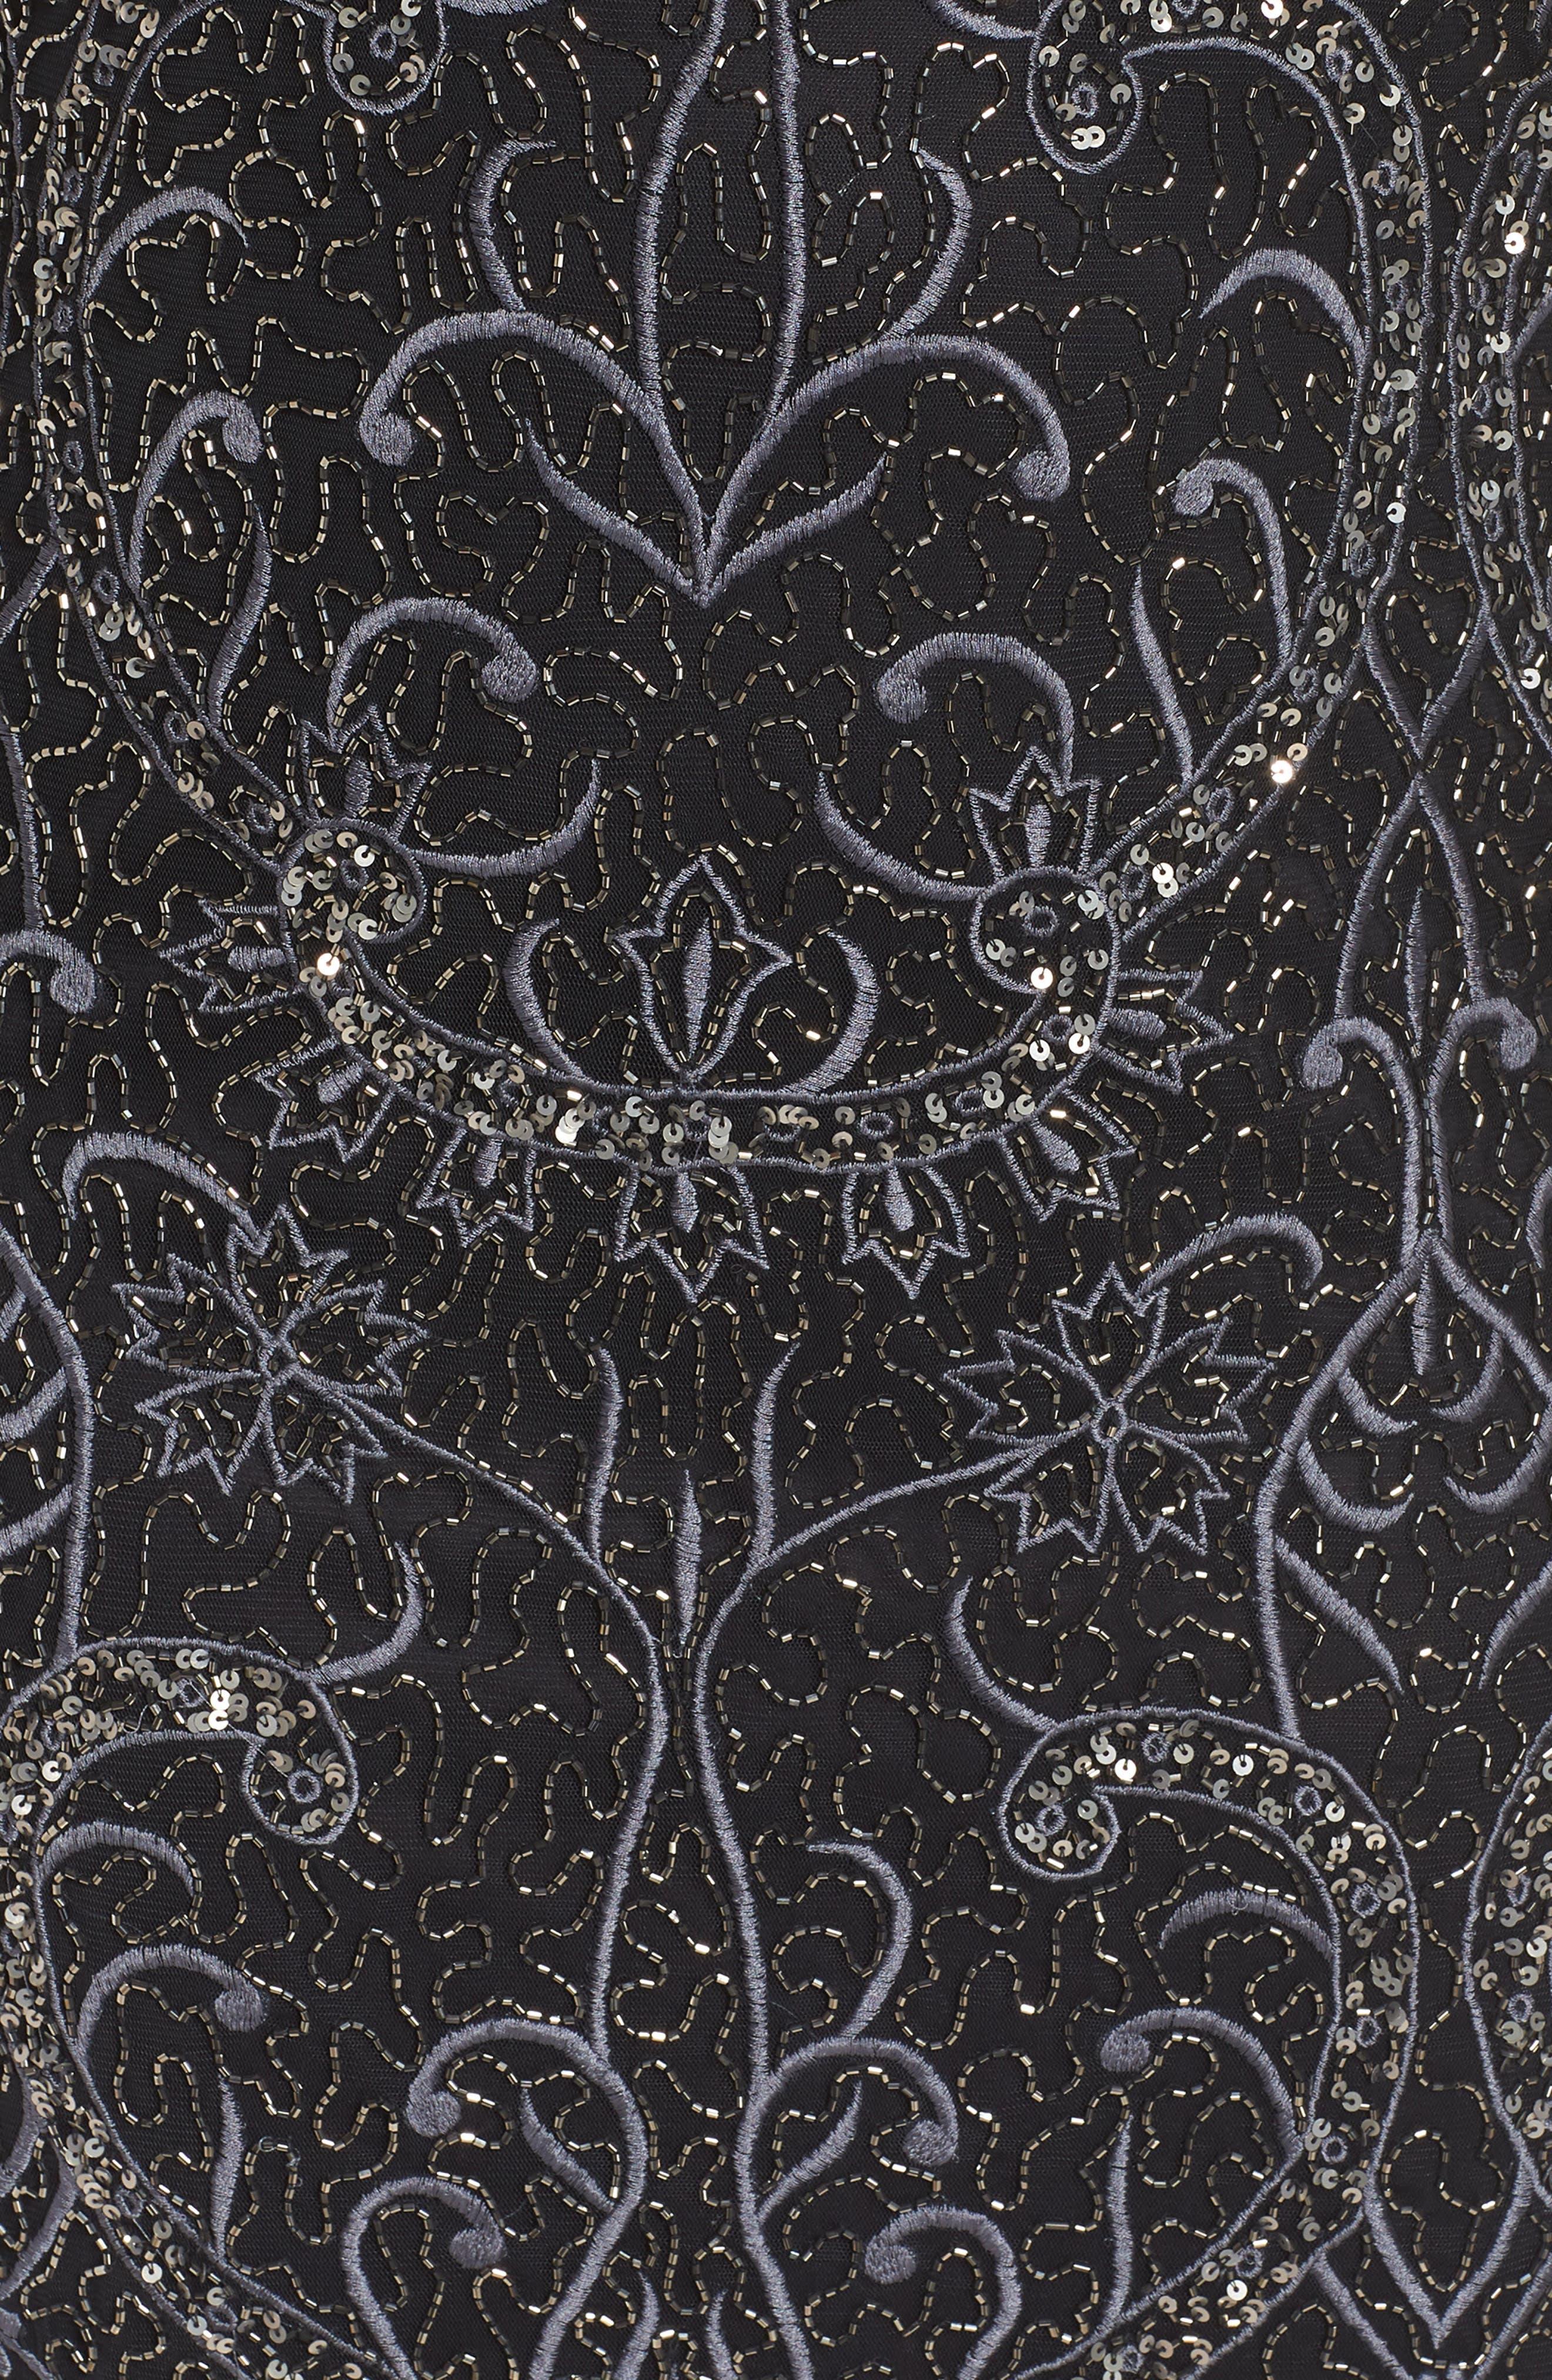 Embellished Sheath Dress,                             Alternate thumbnail 6, color,                             001